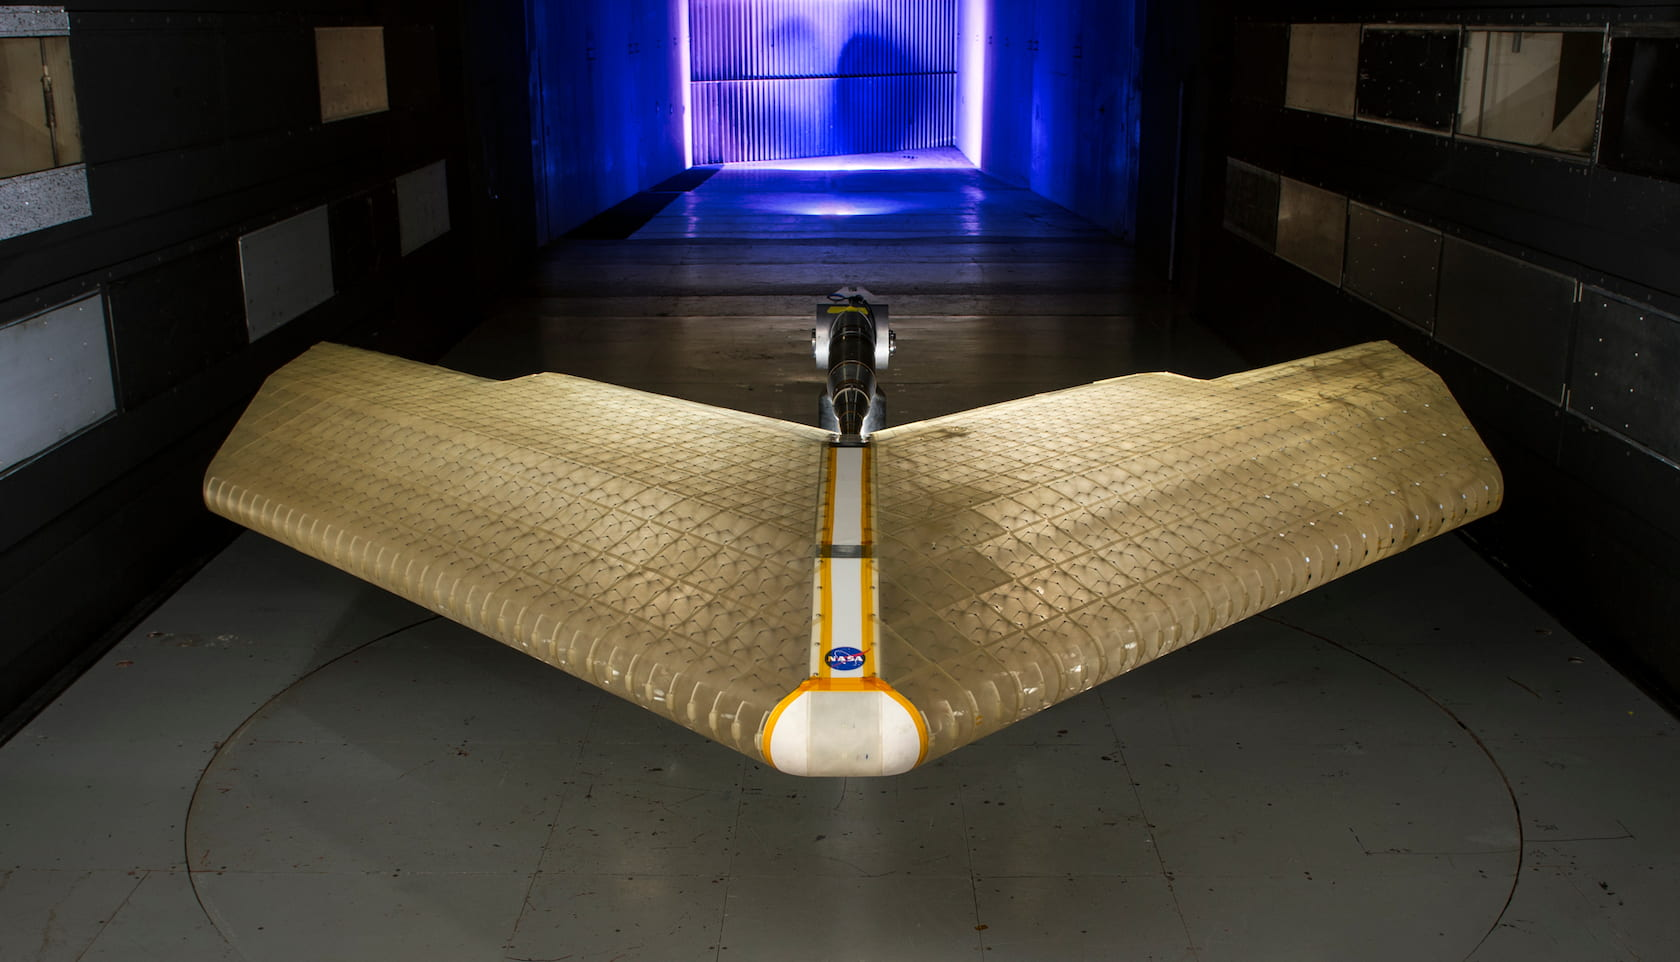 Asa inteligente incrível da NASA pode se transformar enquanto voa